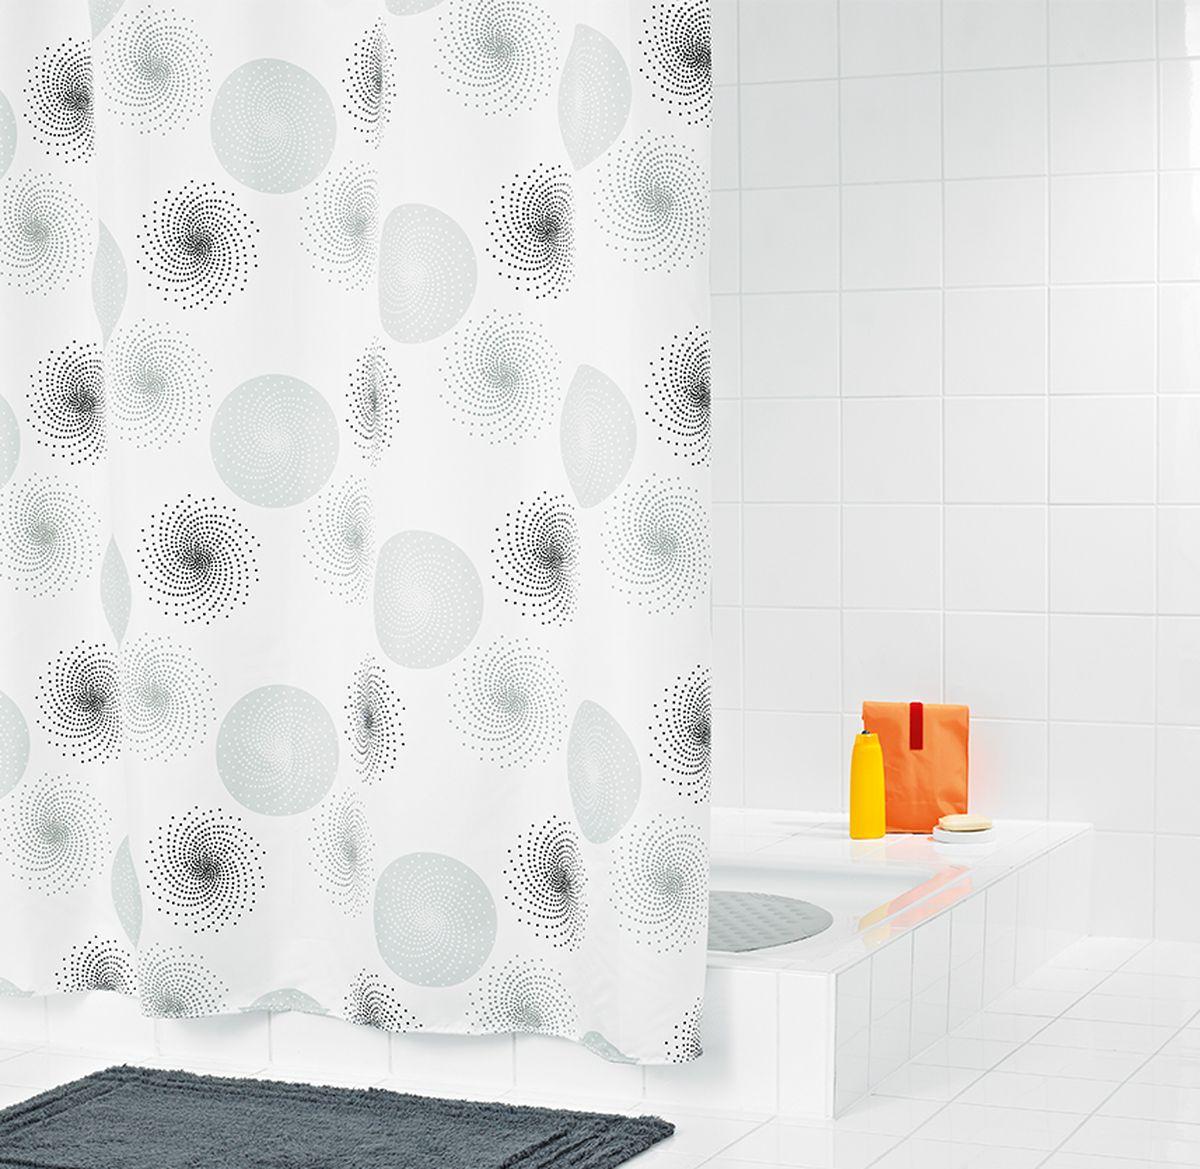 Штора для ванной комнаты Ridder  Hurricane , цвет: белый, серый, 180 х 200 см - Шторки, кольца и карнизы для ванной